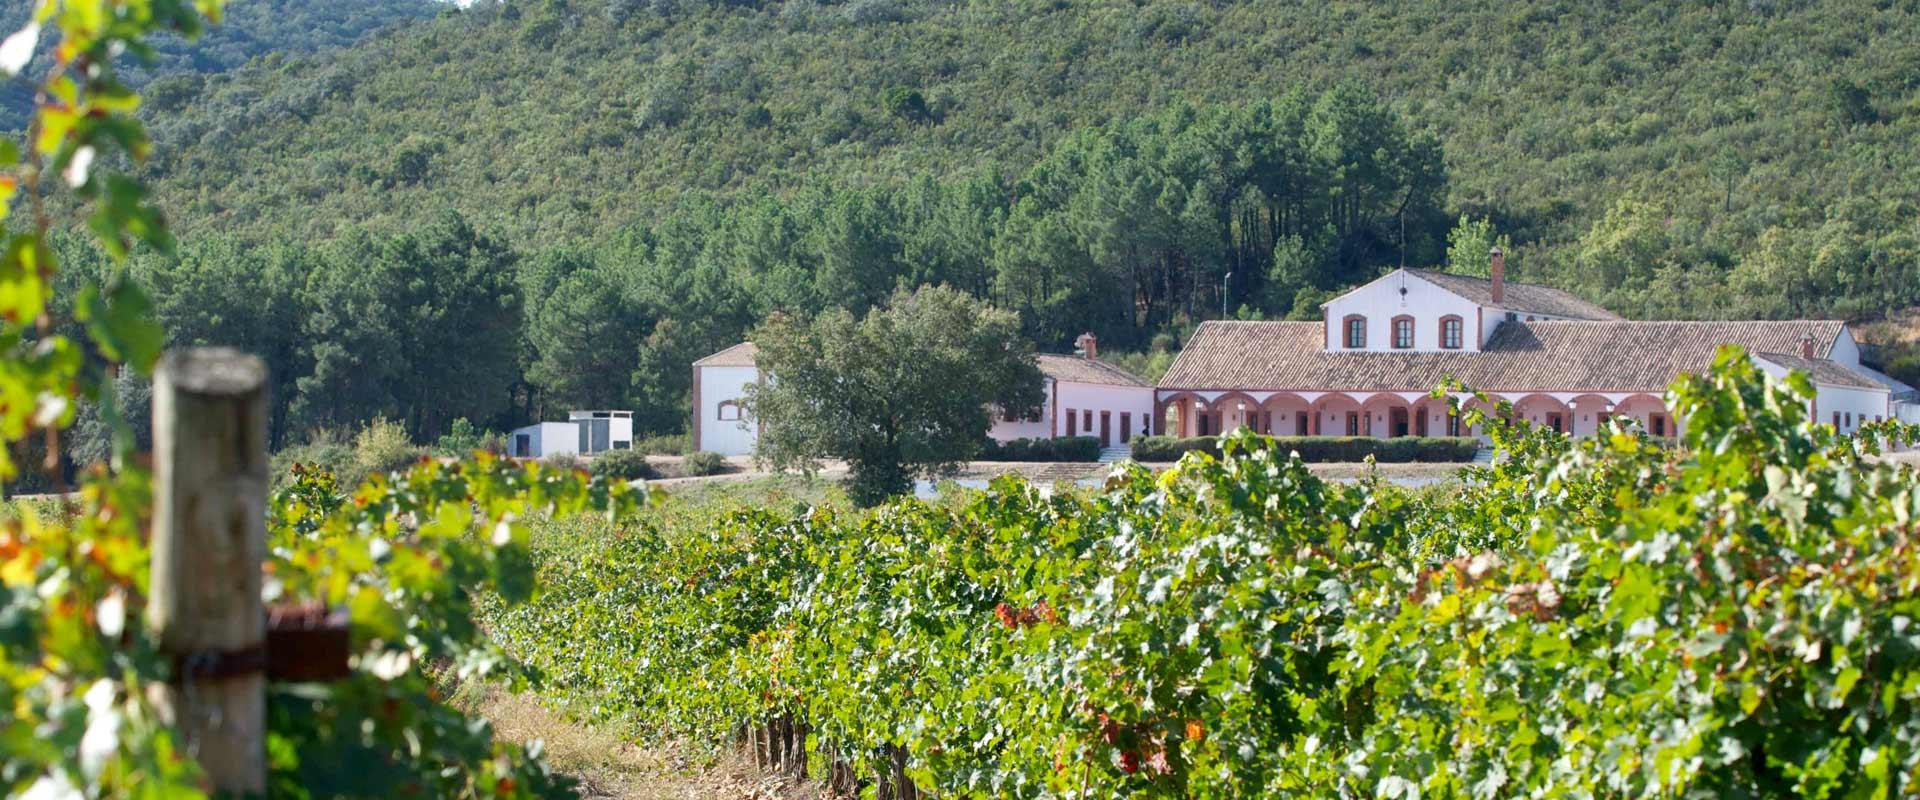 bodega-dehesa-del-carrizal-vino-doowine